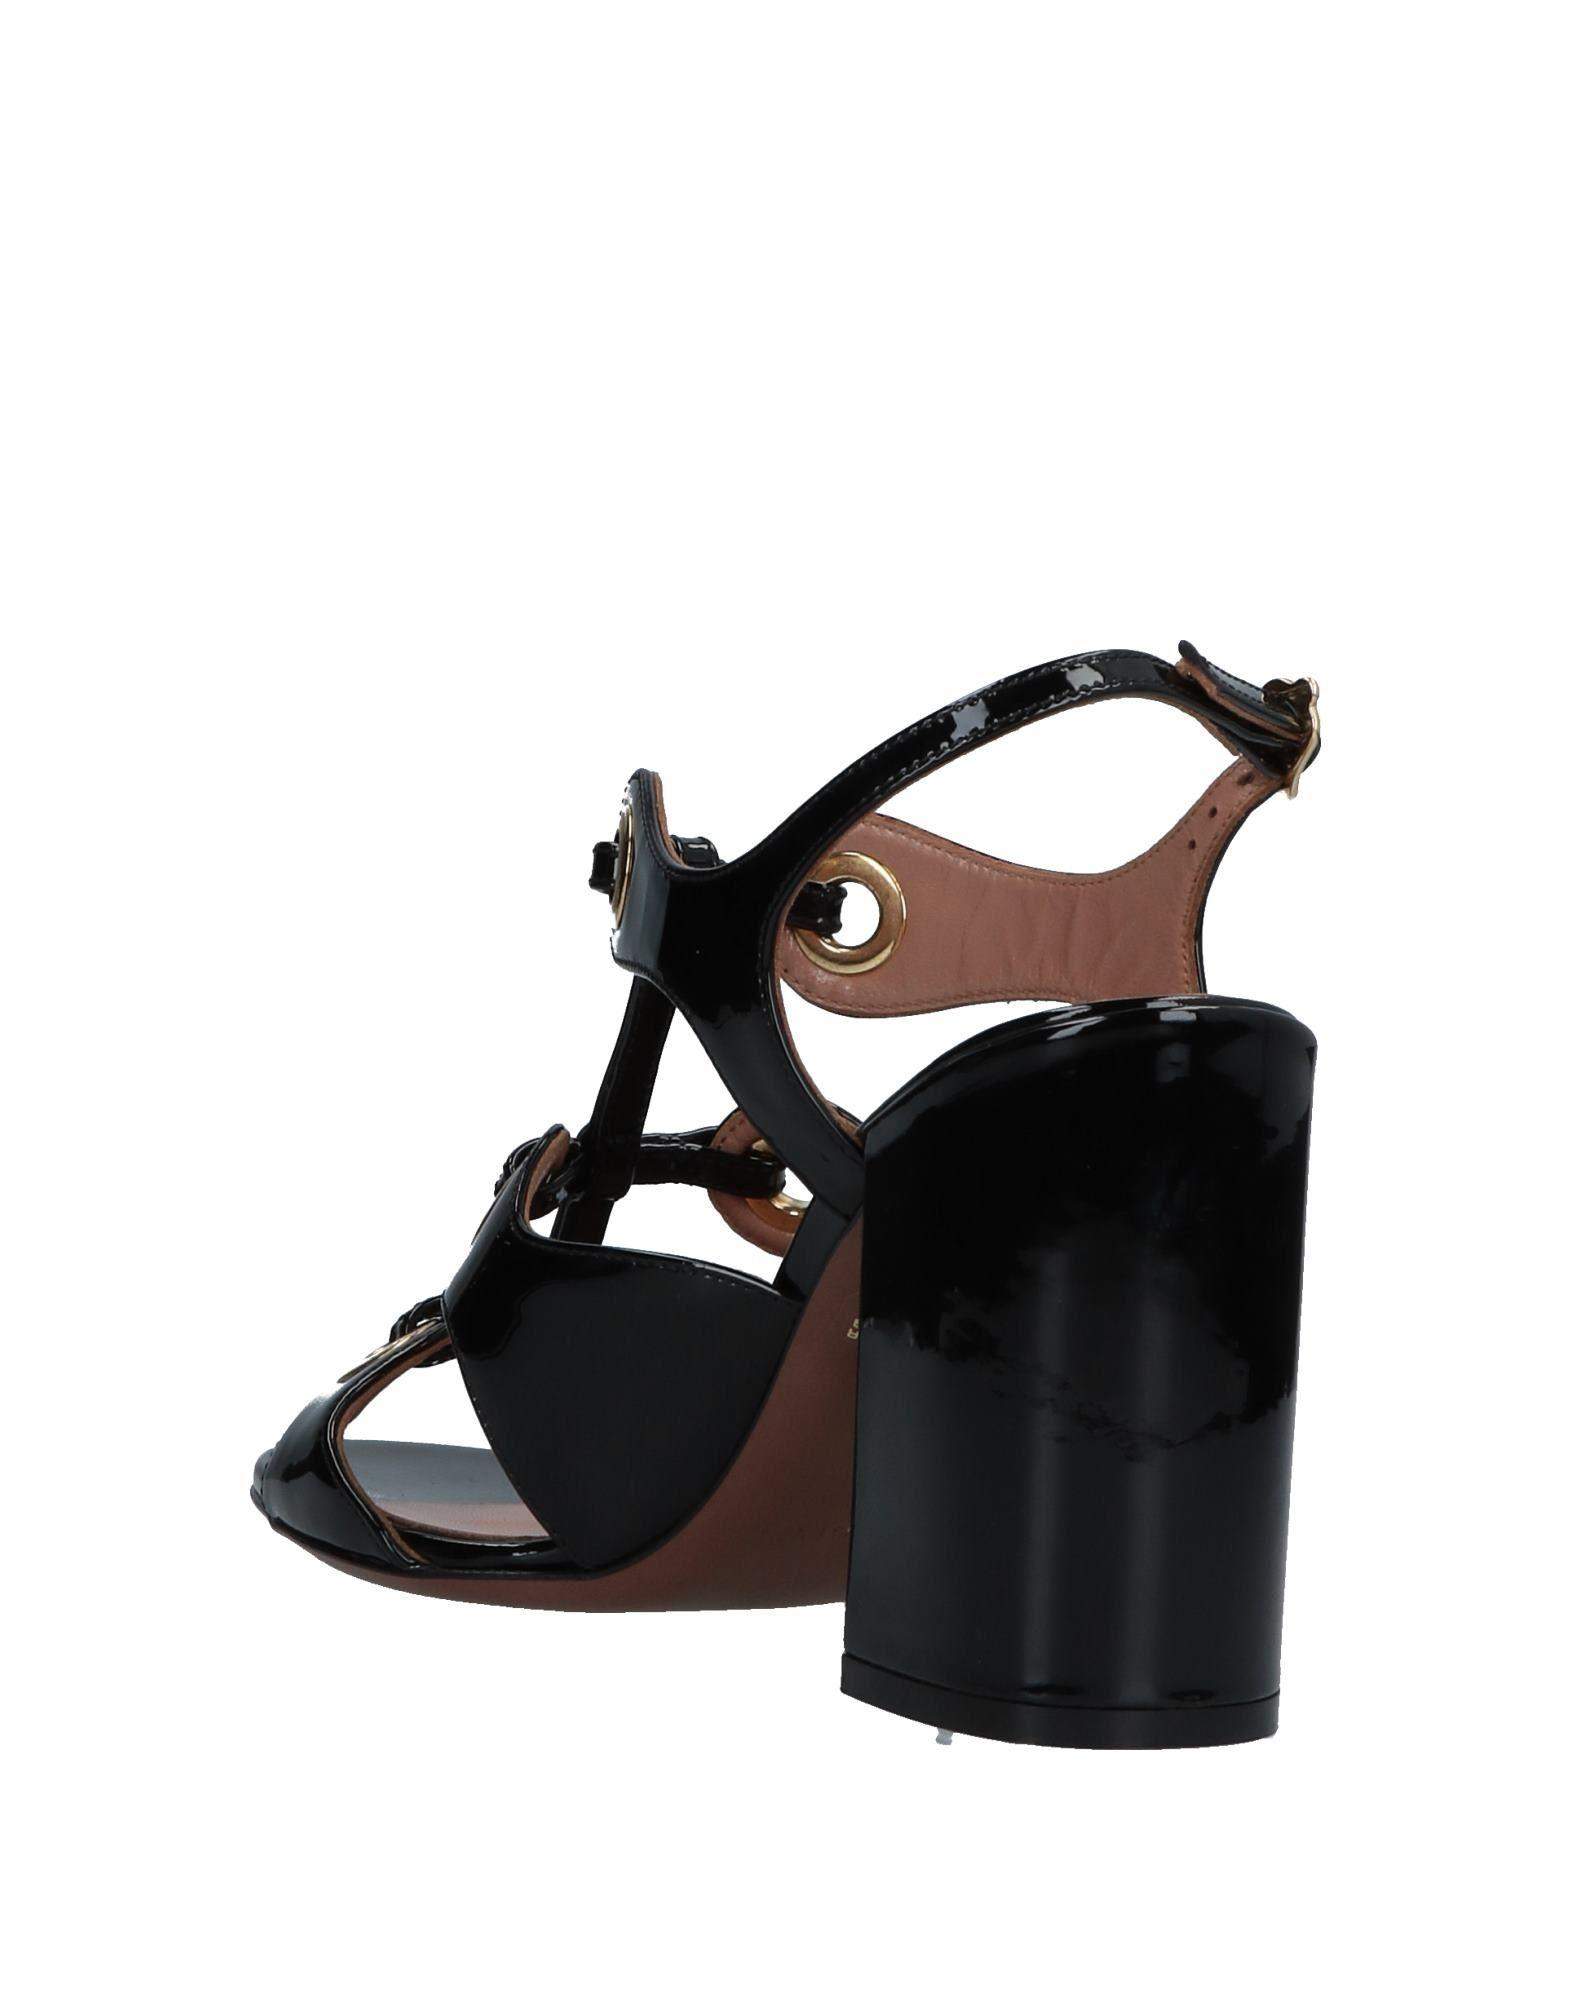 d58206f62f3ad L Autre Chose Sandals in Black - Lyst